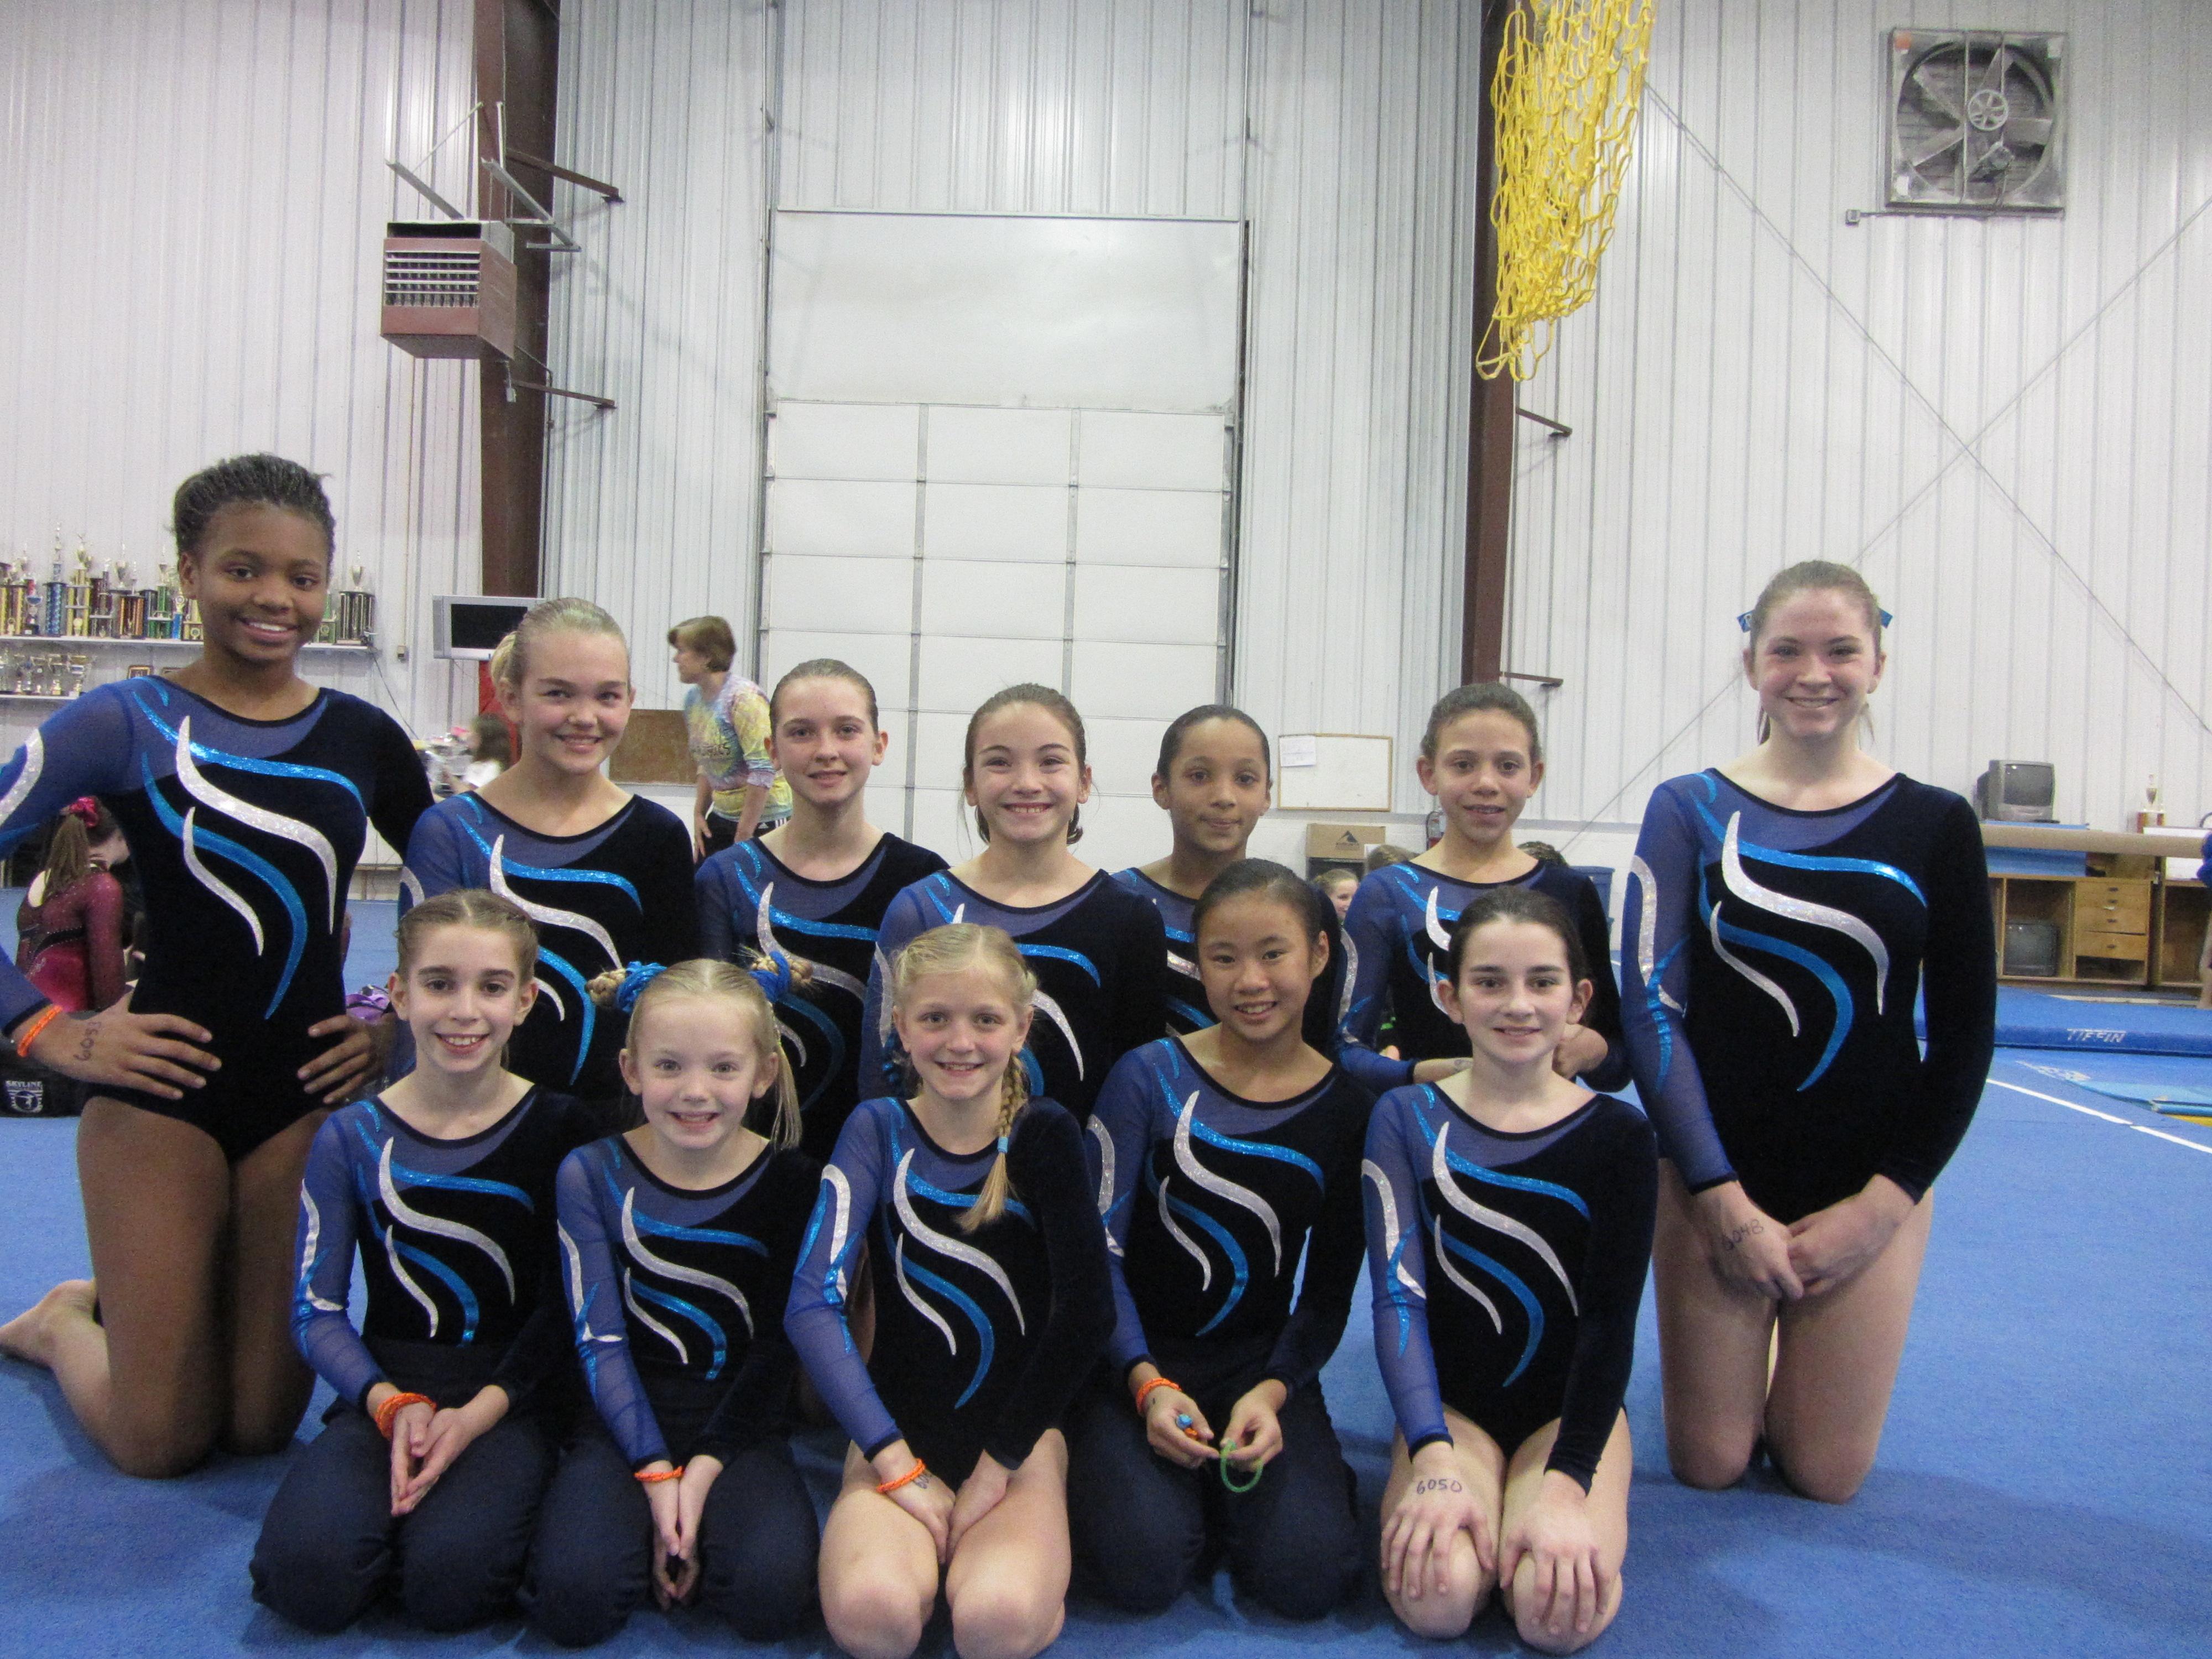 Gold Medal Gymnastics, Smyrna Delaware (DE ...